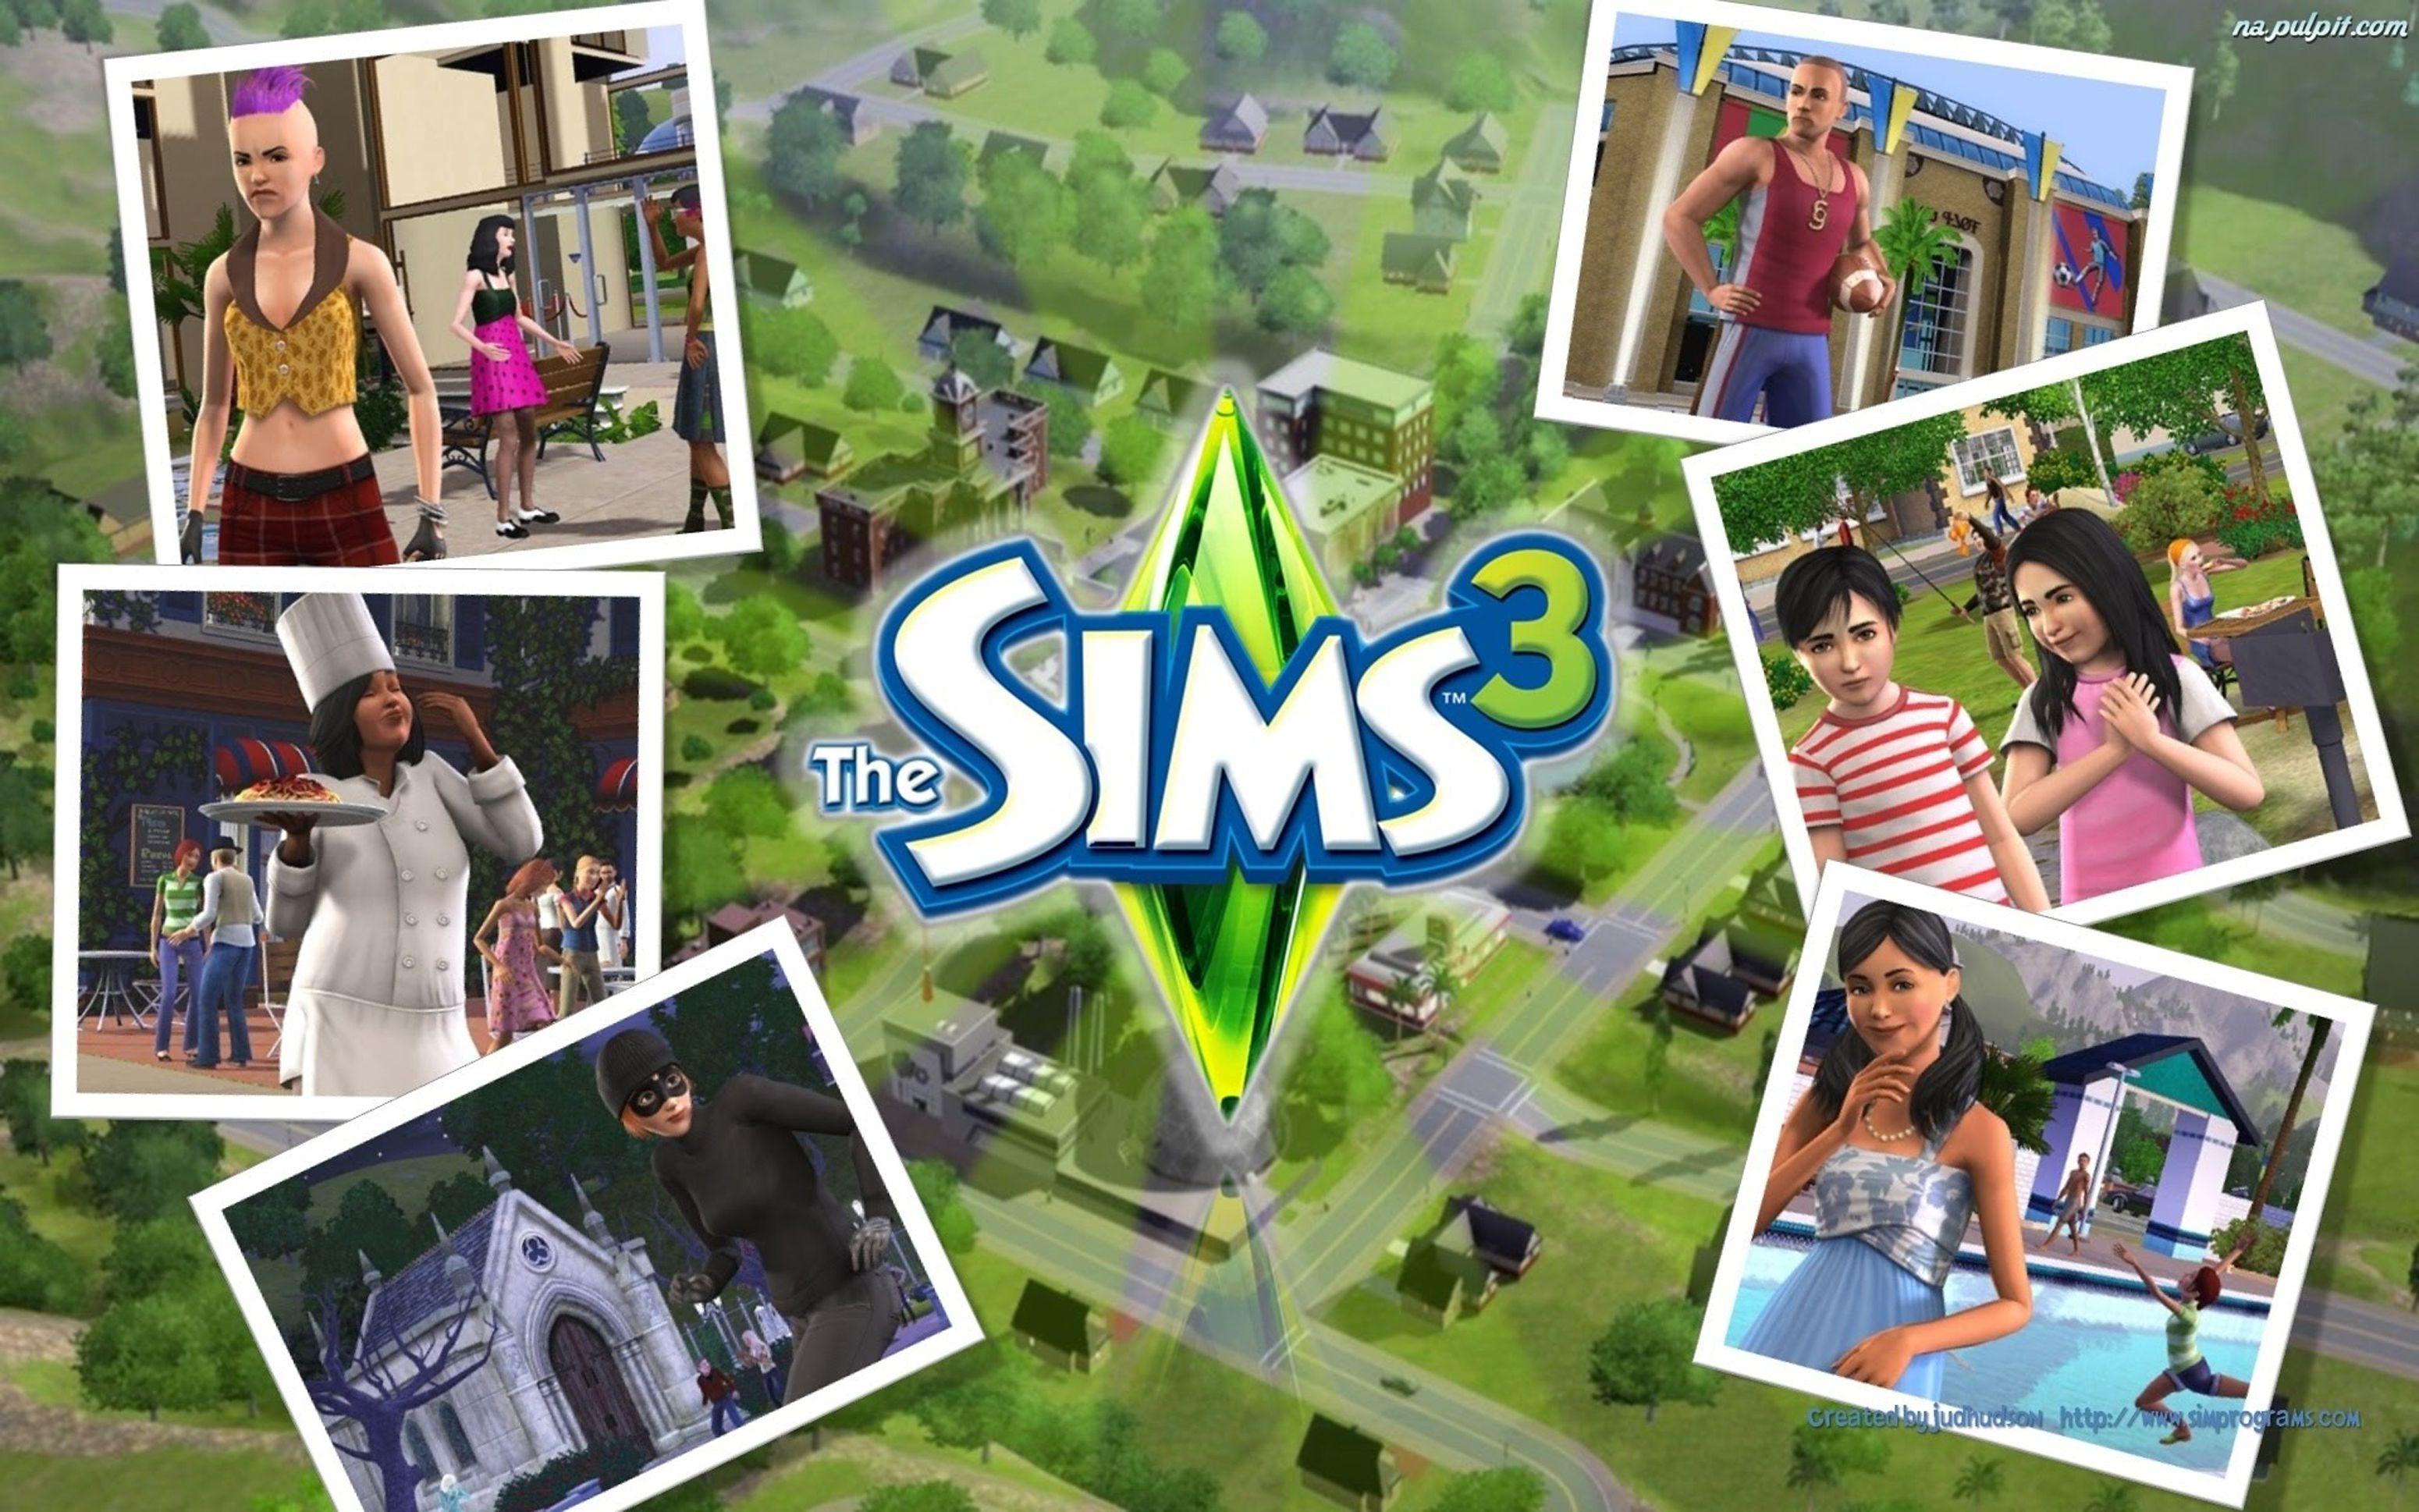 Sims 3 nudity mod